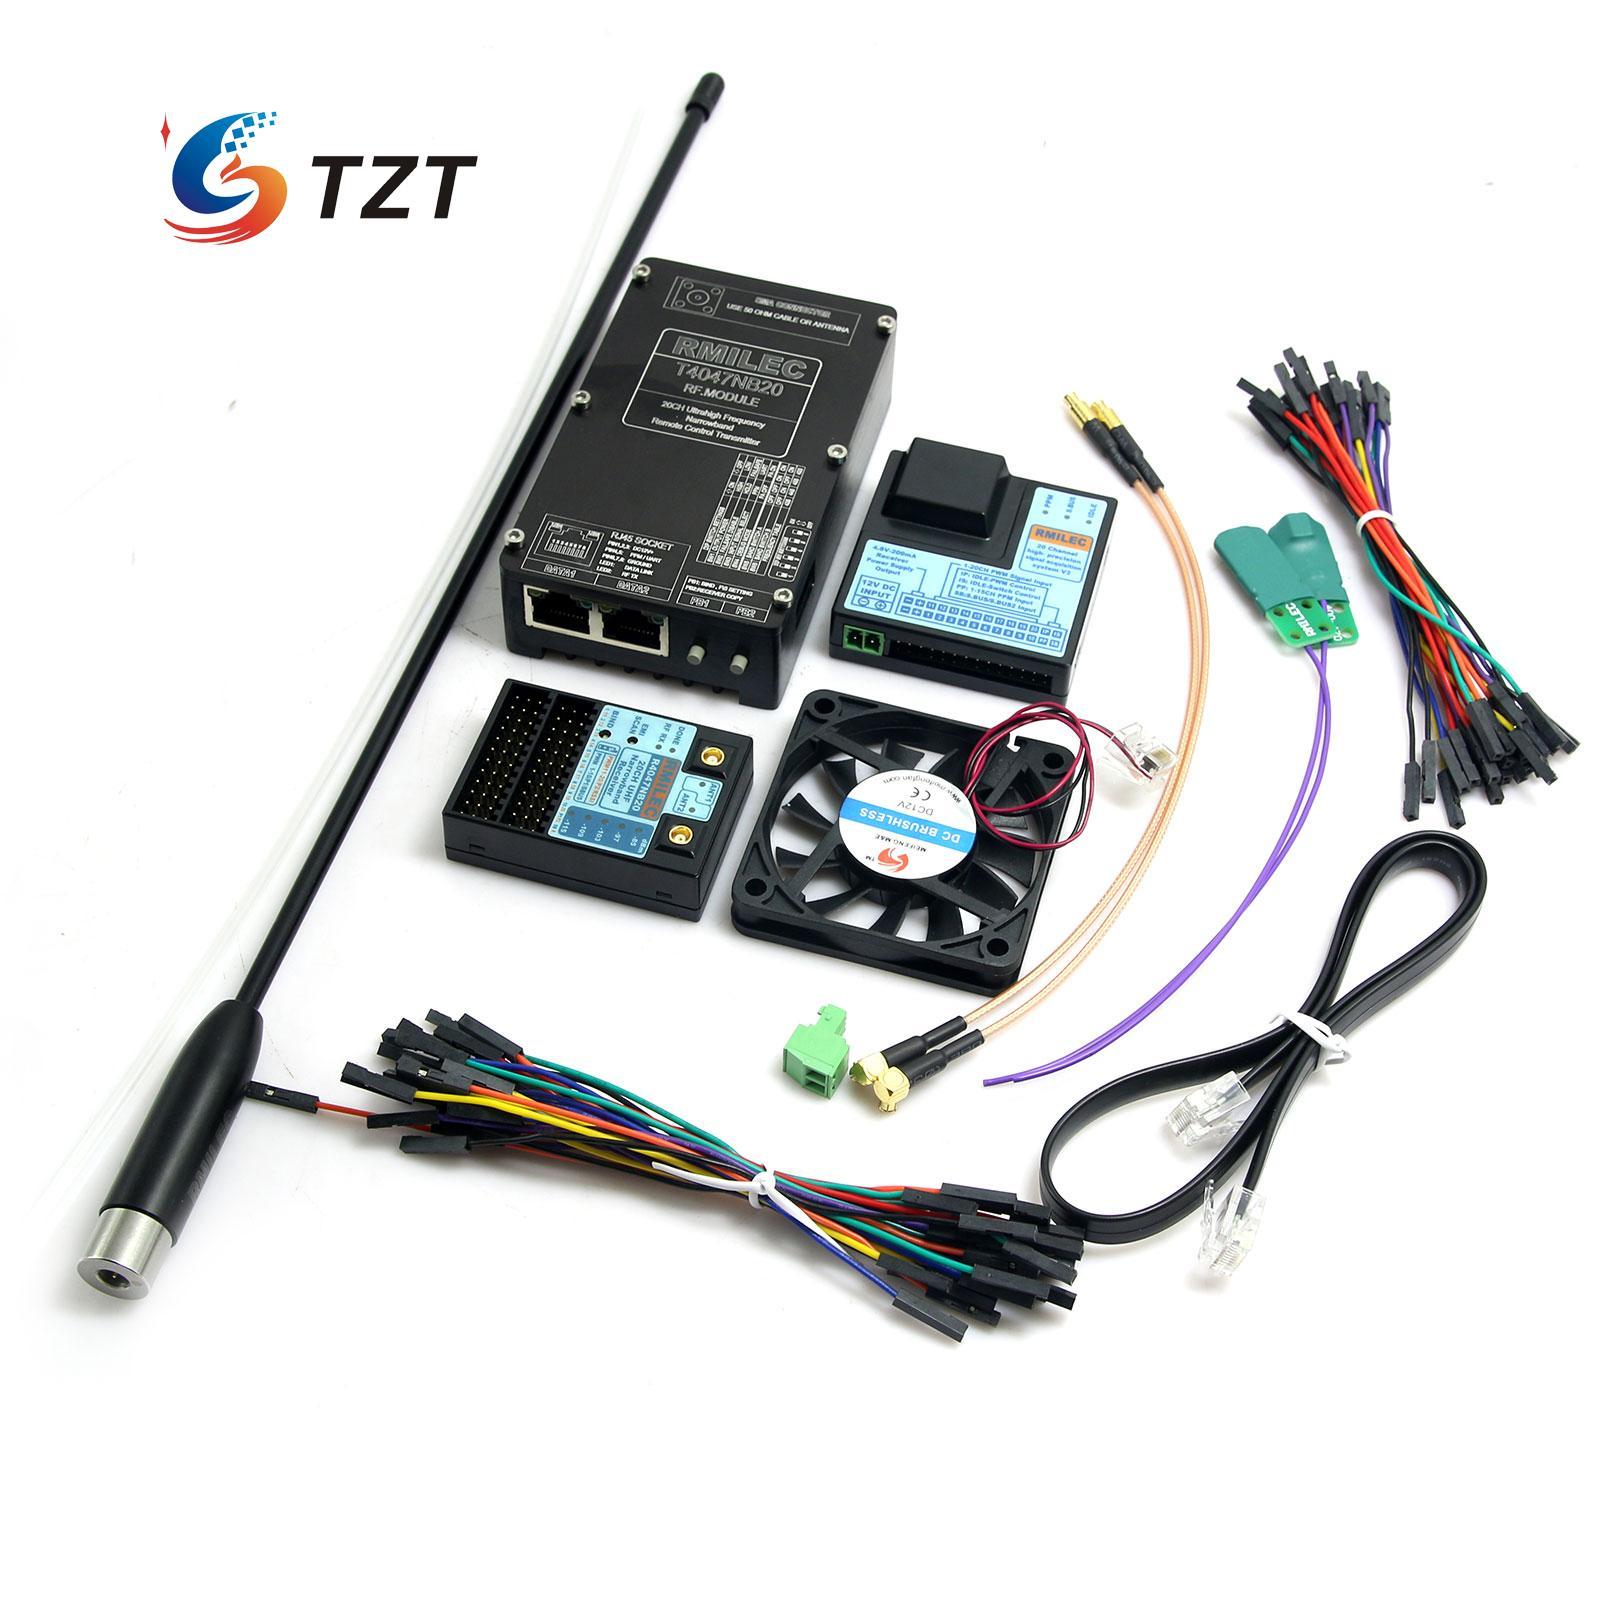 FPV 433mhz Transmitter Receiver UHF Tx Rx 20CH RF Remote Control System RMILEC NB20